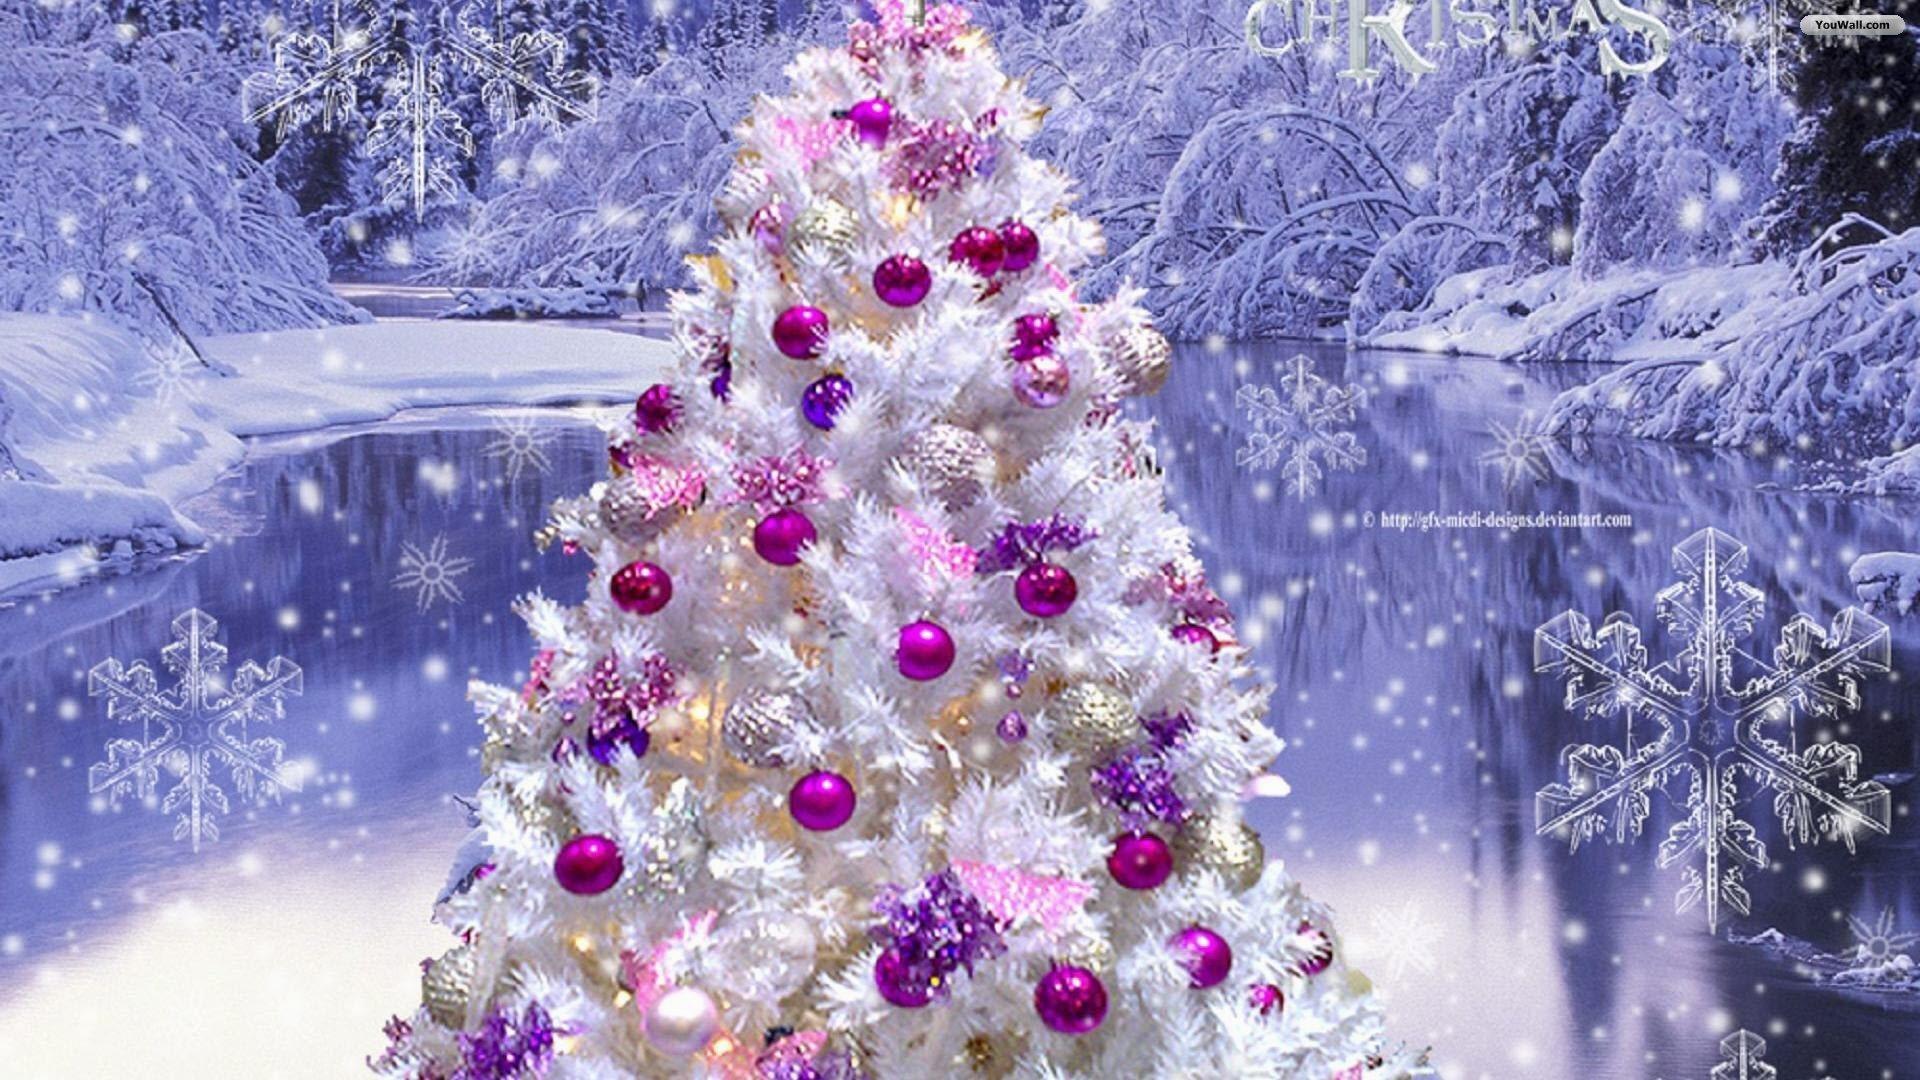 Res: 1920x1080, 1. christmas-wallpaper-for-desktop-free1-600x338